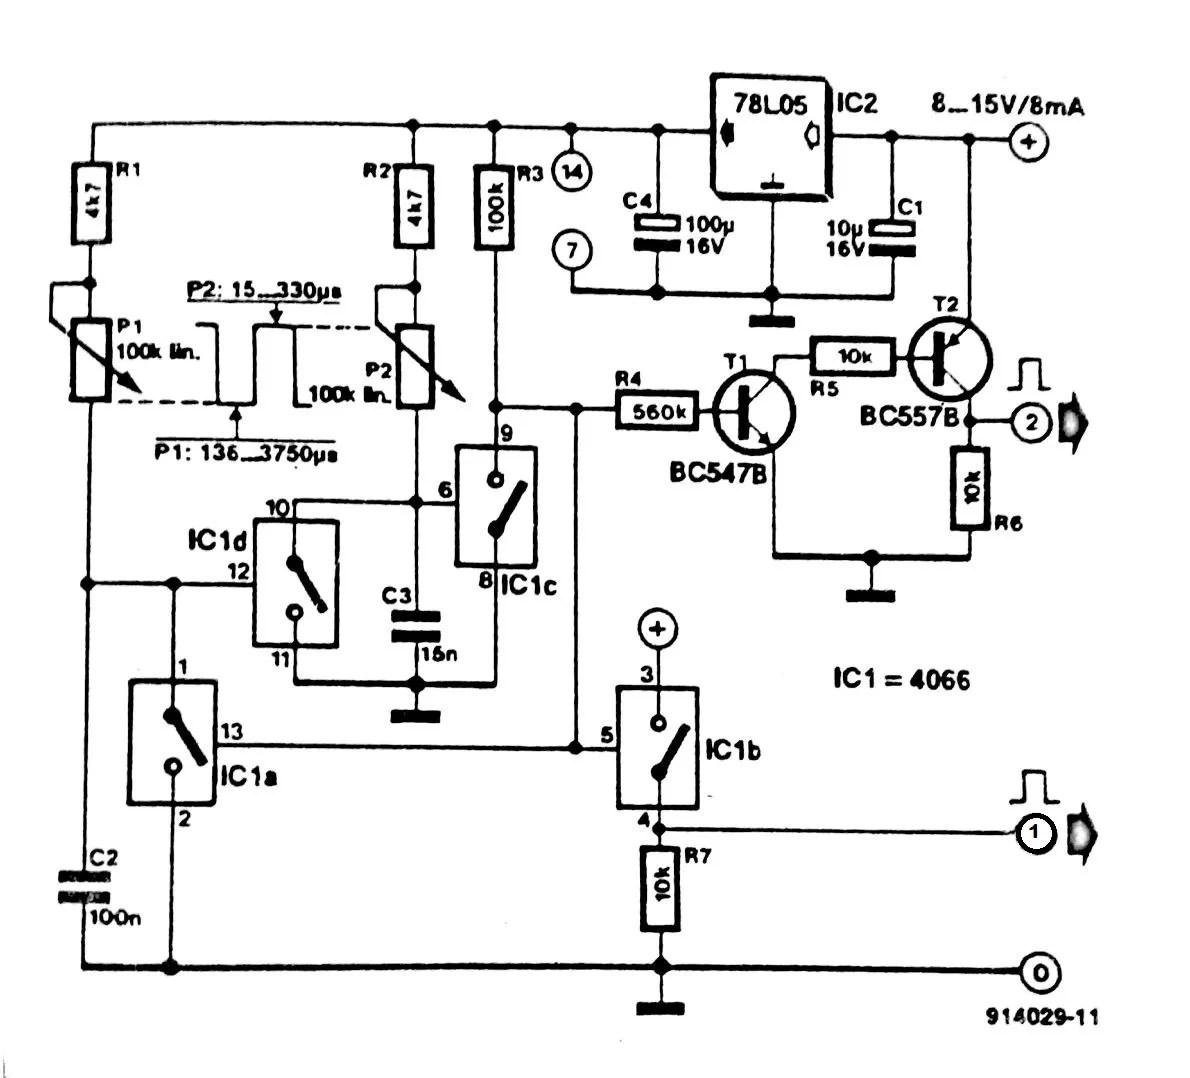 Pulse generator one 4066 circuit diagram wiring schematic diagram at ww35 freeautoresponder co